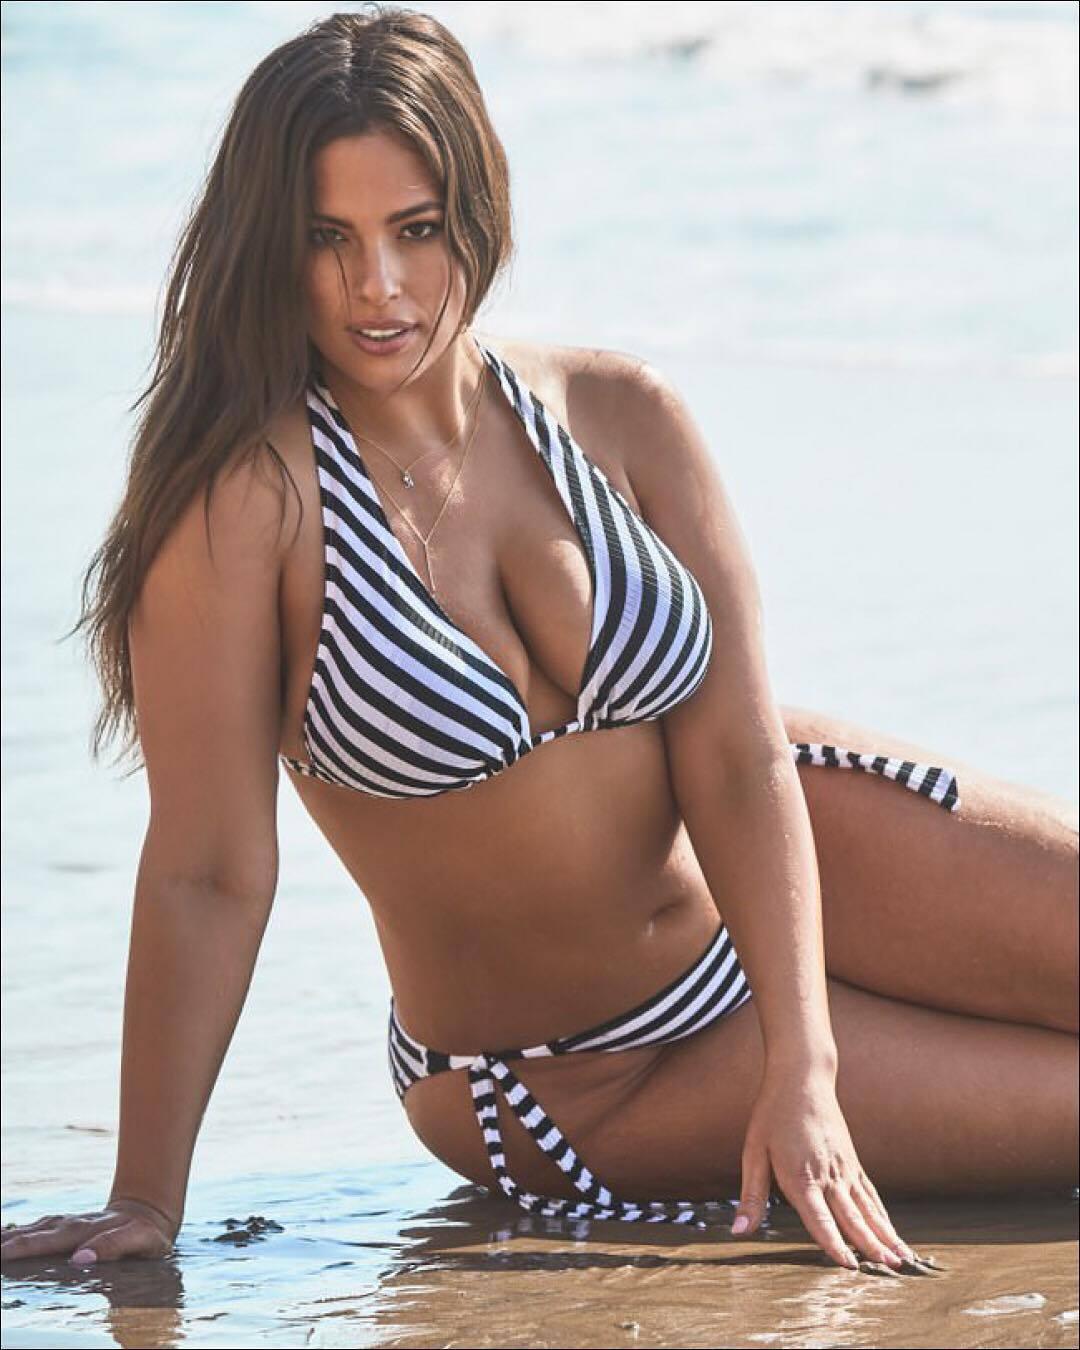 422b5d6fd3f swimwear, black and white, bikini top, bikini bottoms, bikini ...